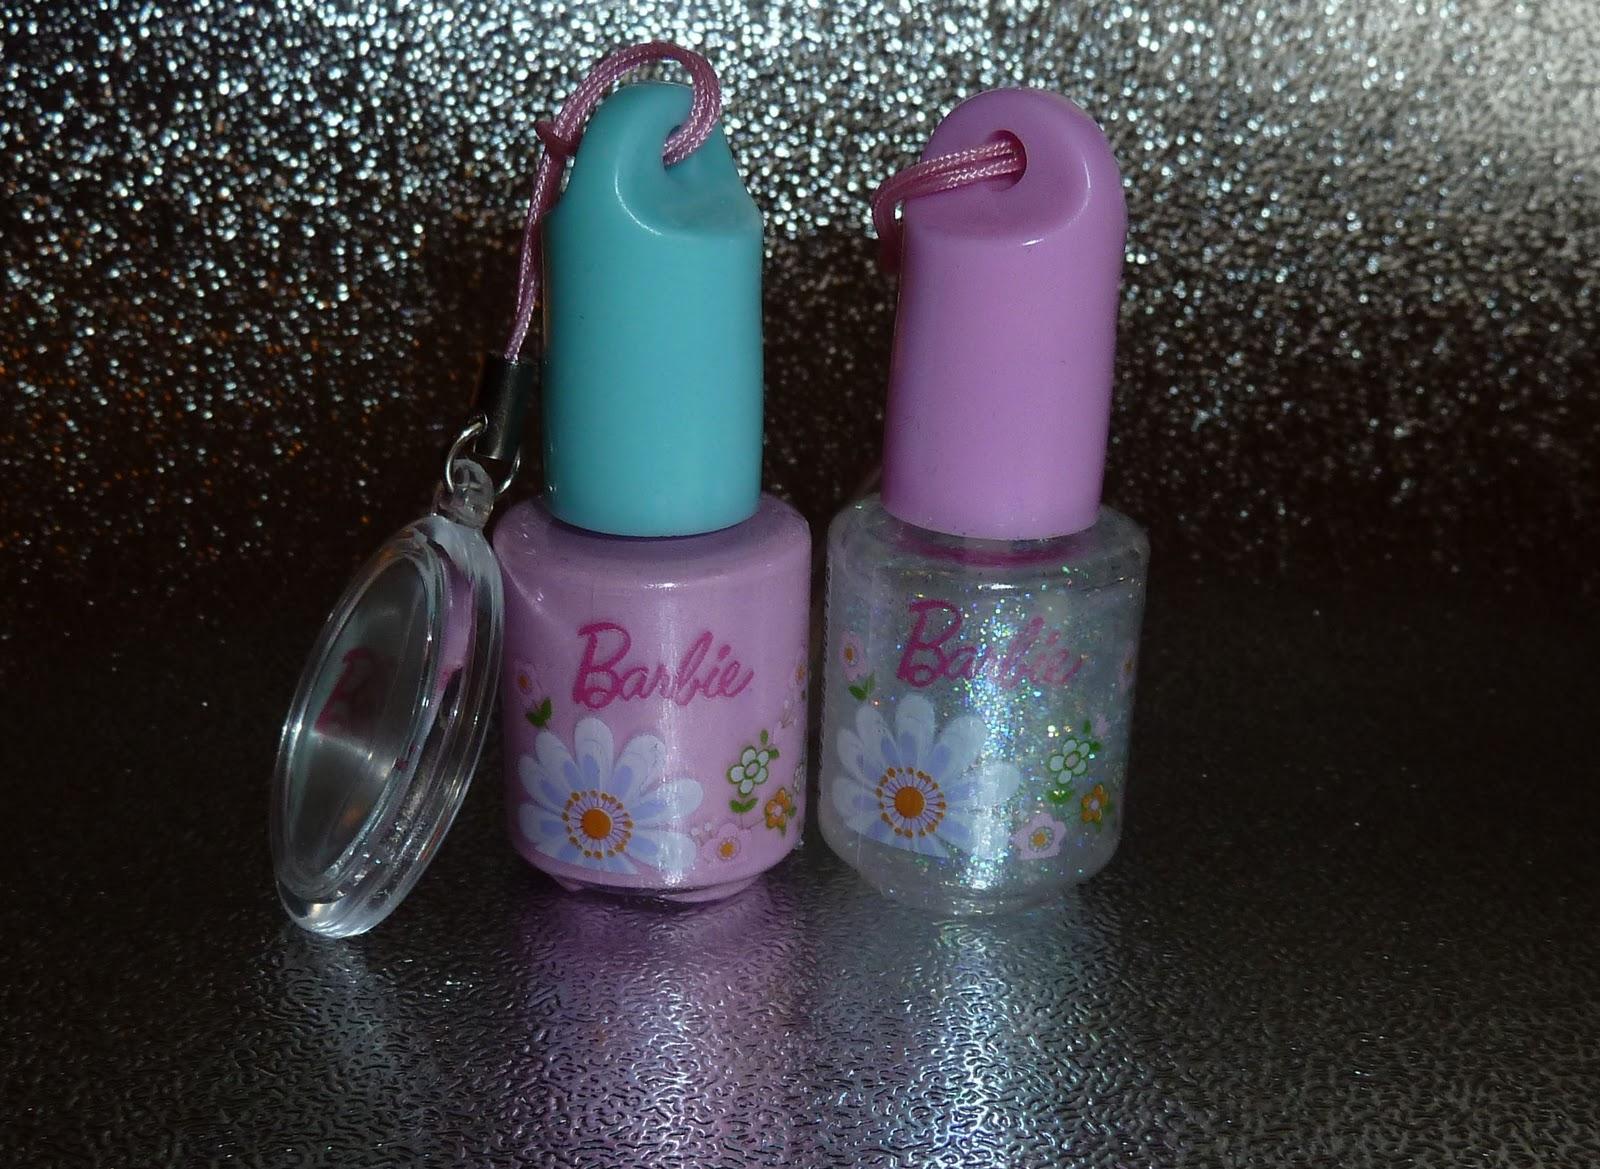 NailsByStephanie: Barbie Nail Polish